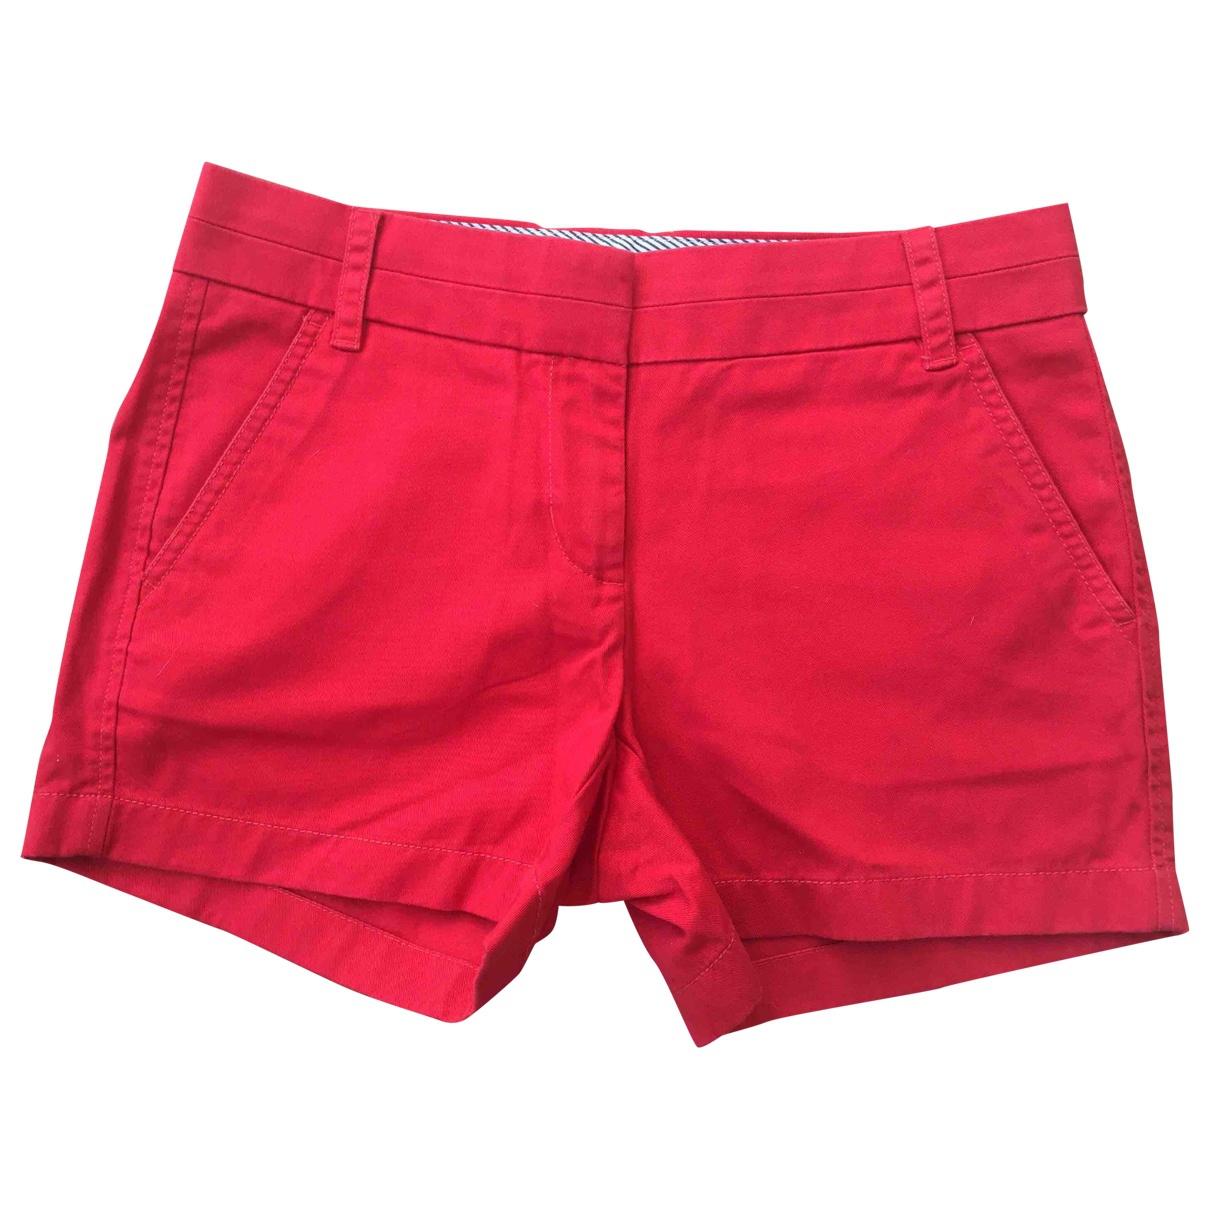 J.crew \N Shorts in  Rot Baumwolle